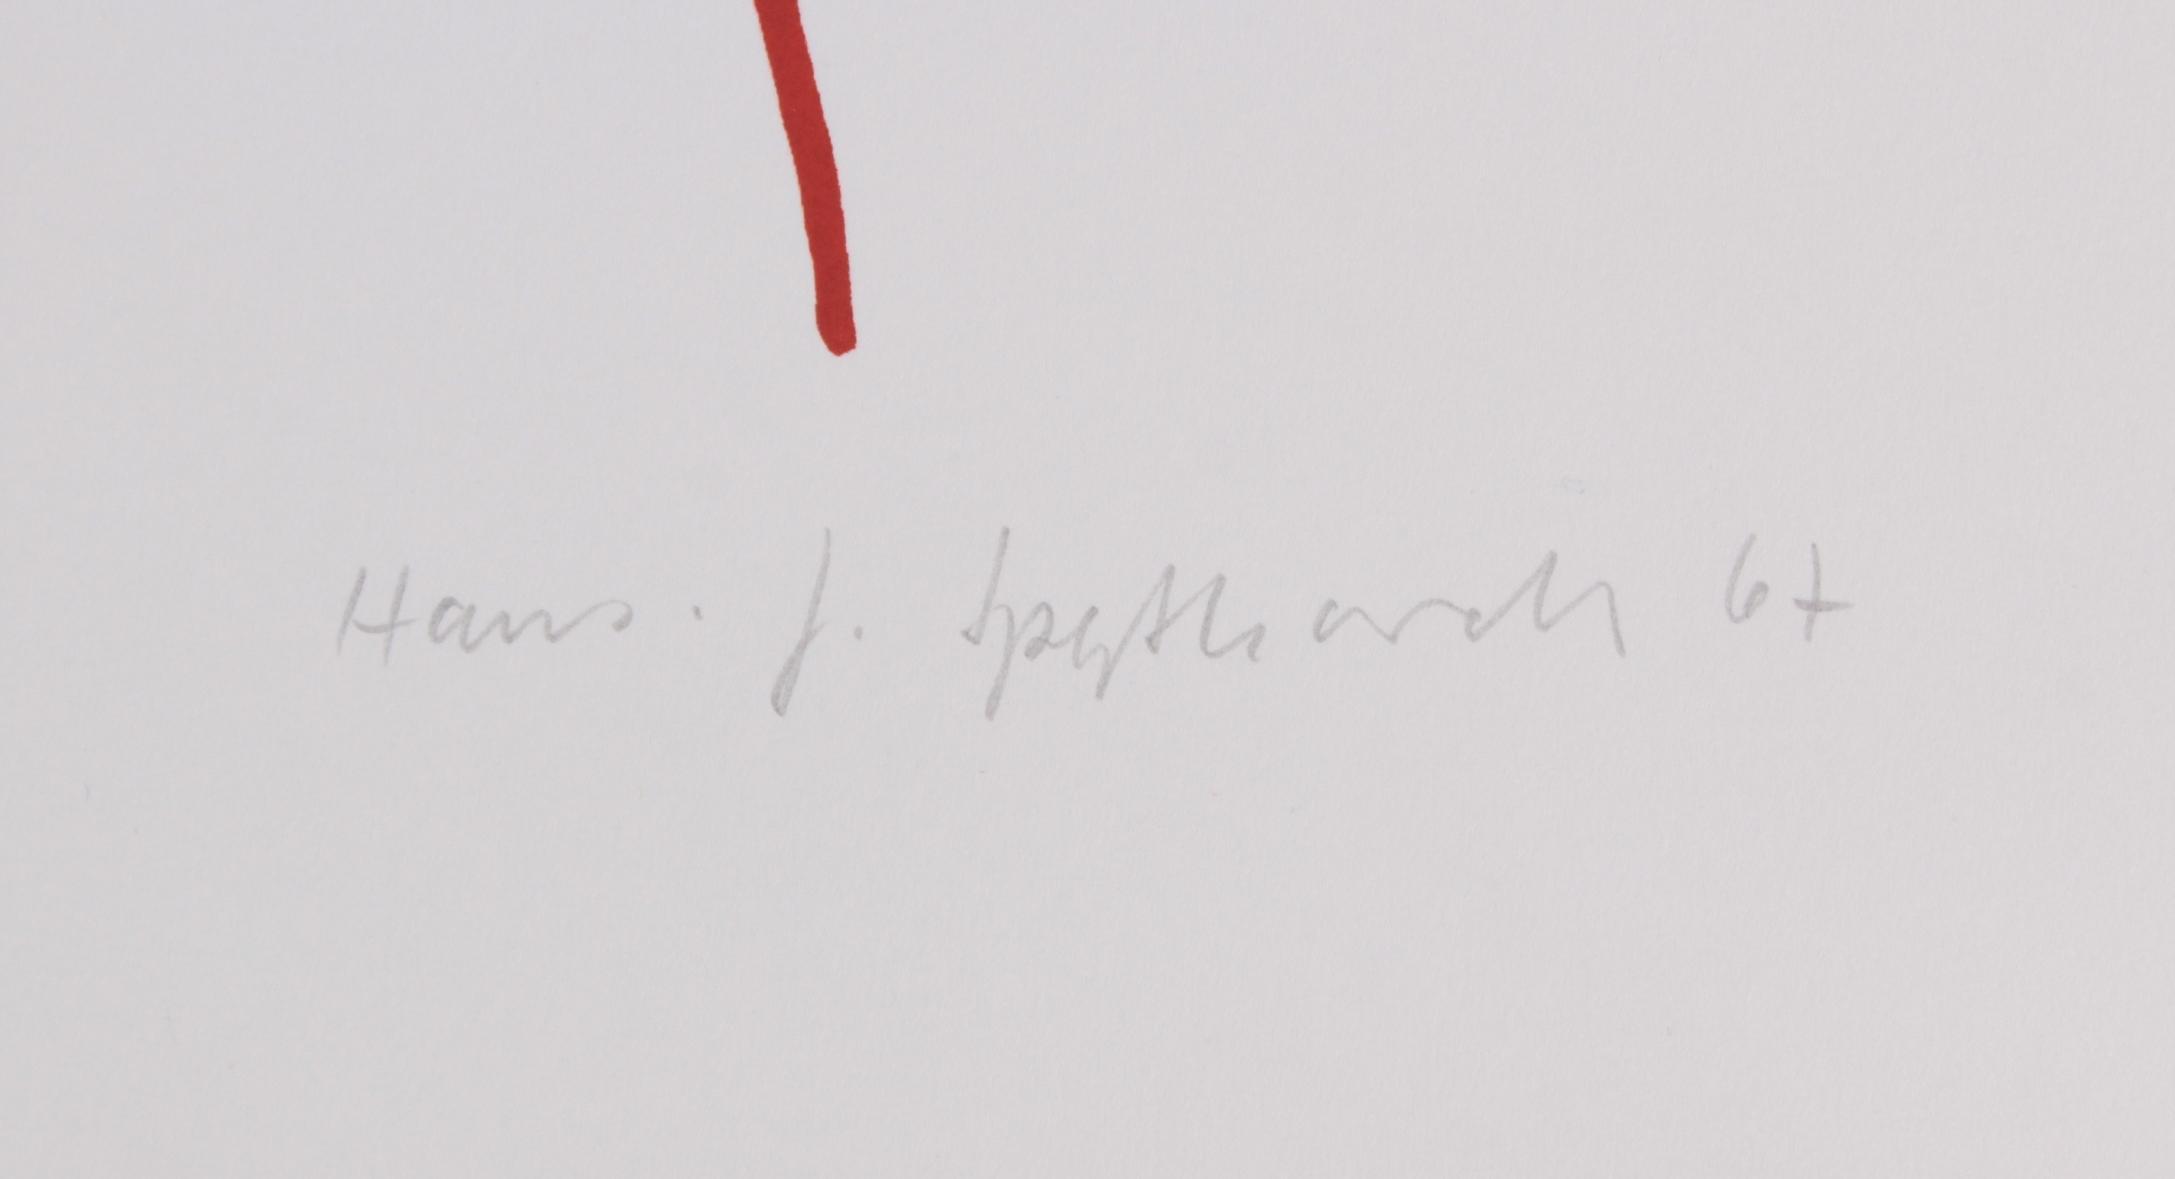 Hans Joachim Speßhardt (Berlin 1935 – lebt u. arbeitet in Berlin)-3